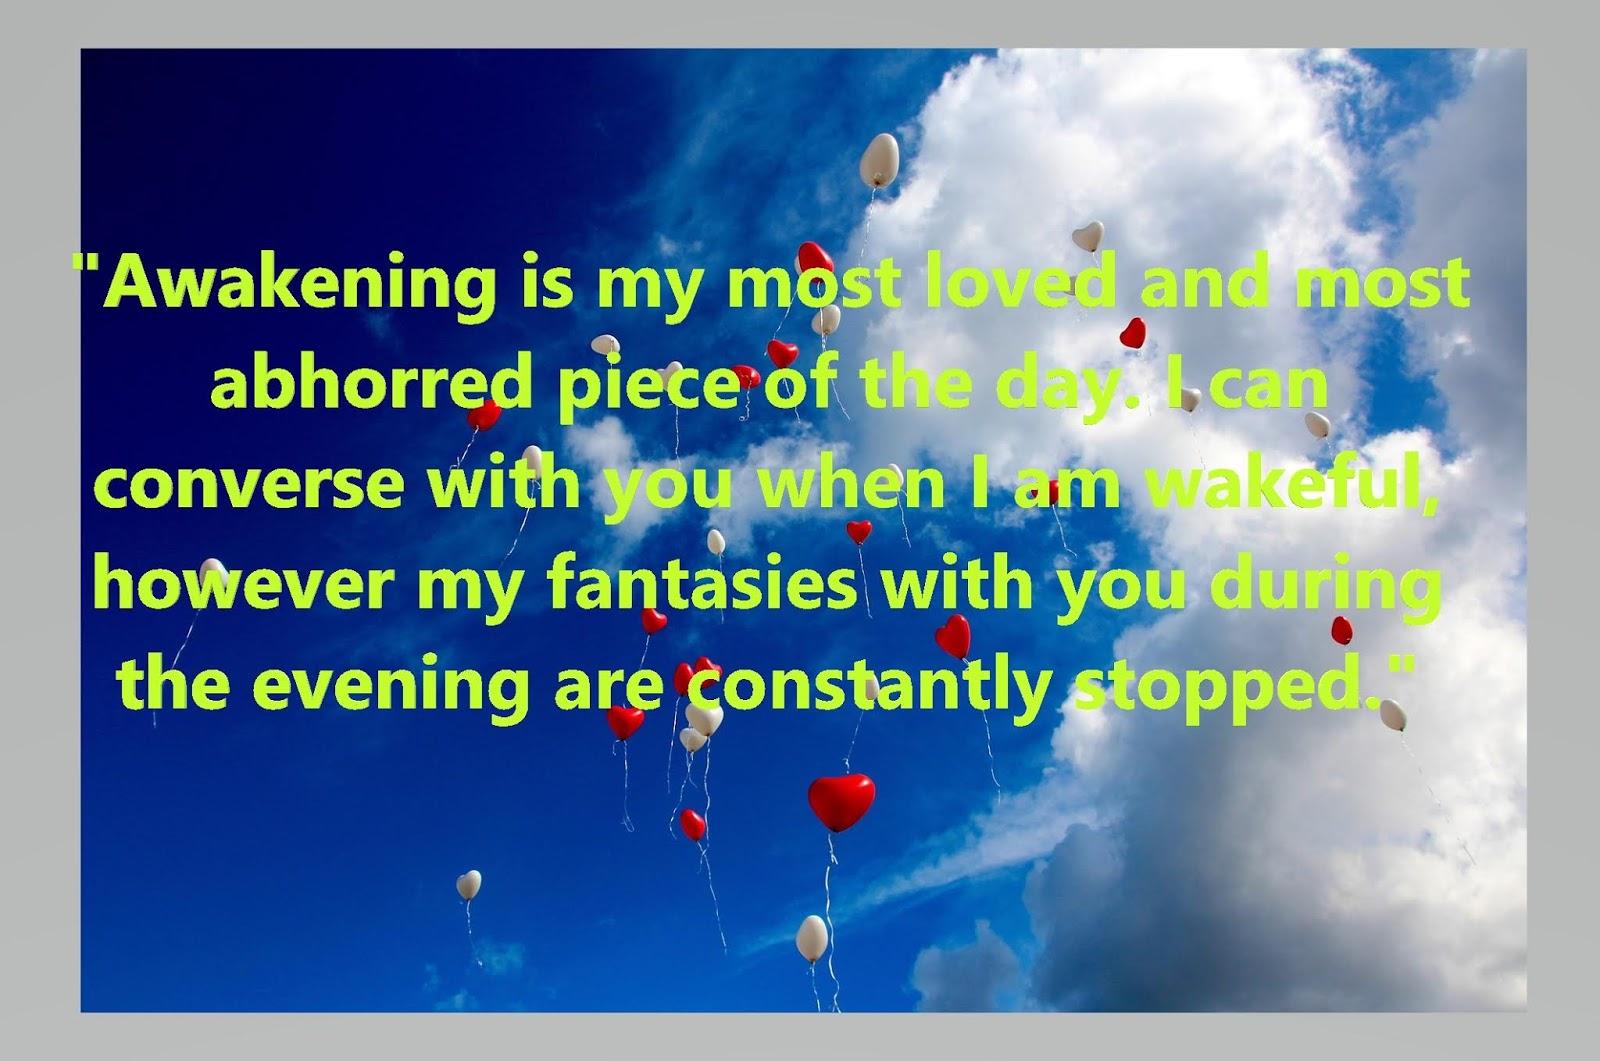 https://www.instacapt.com/2018/09/best-good-morning-love-quotes.html